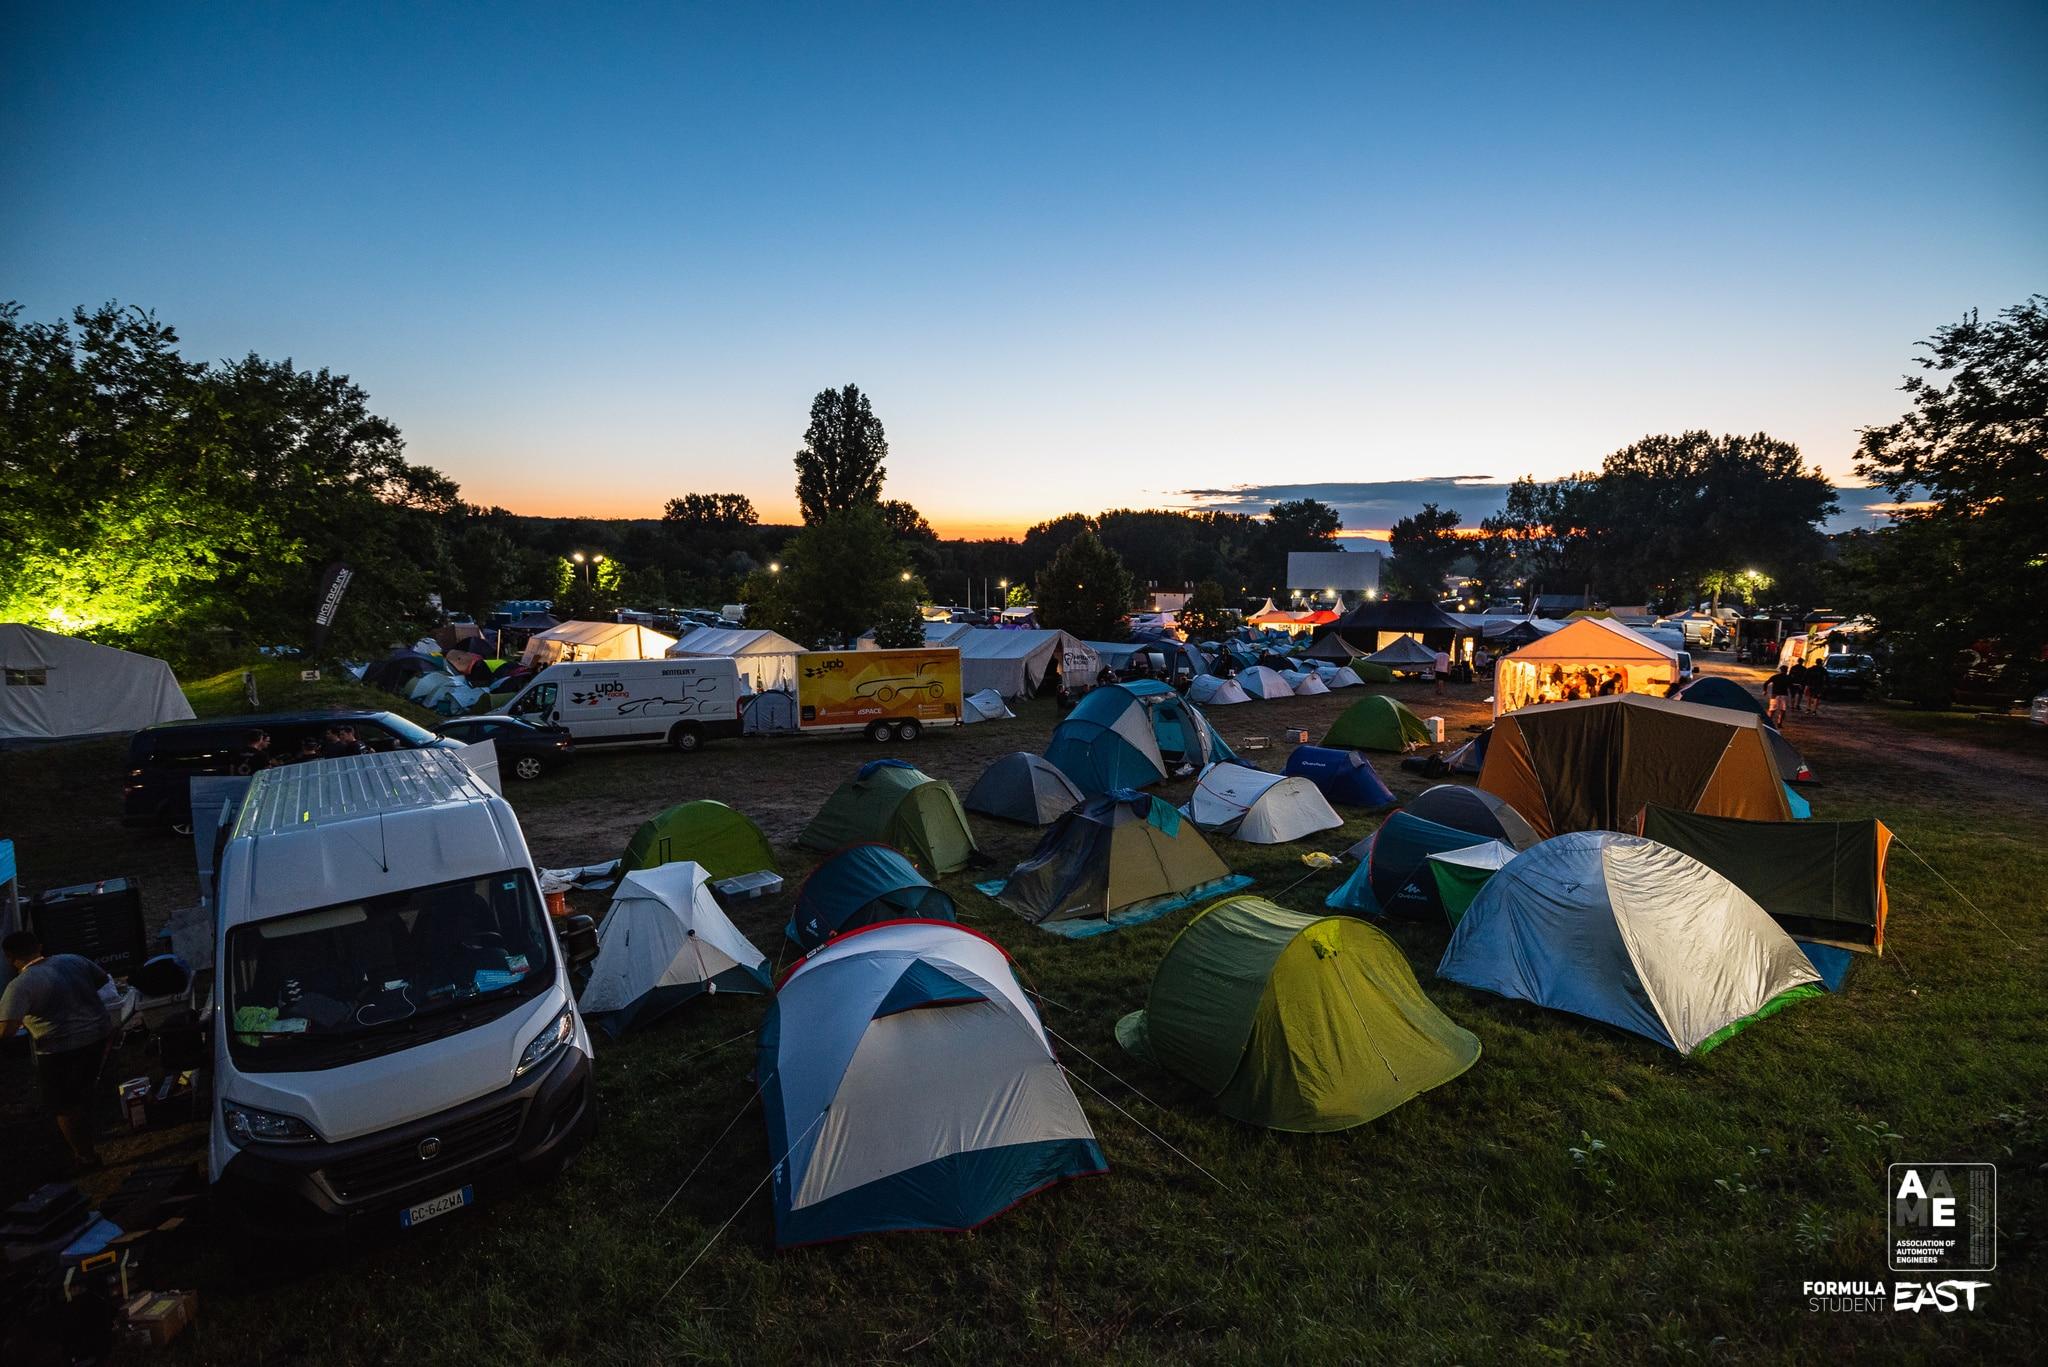 Image du camping de FSEast 2021